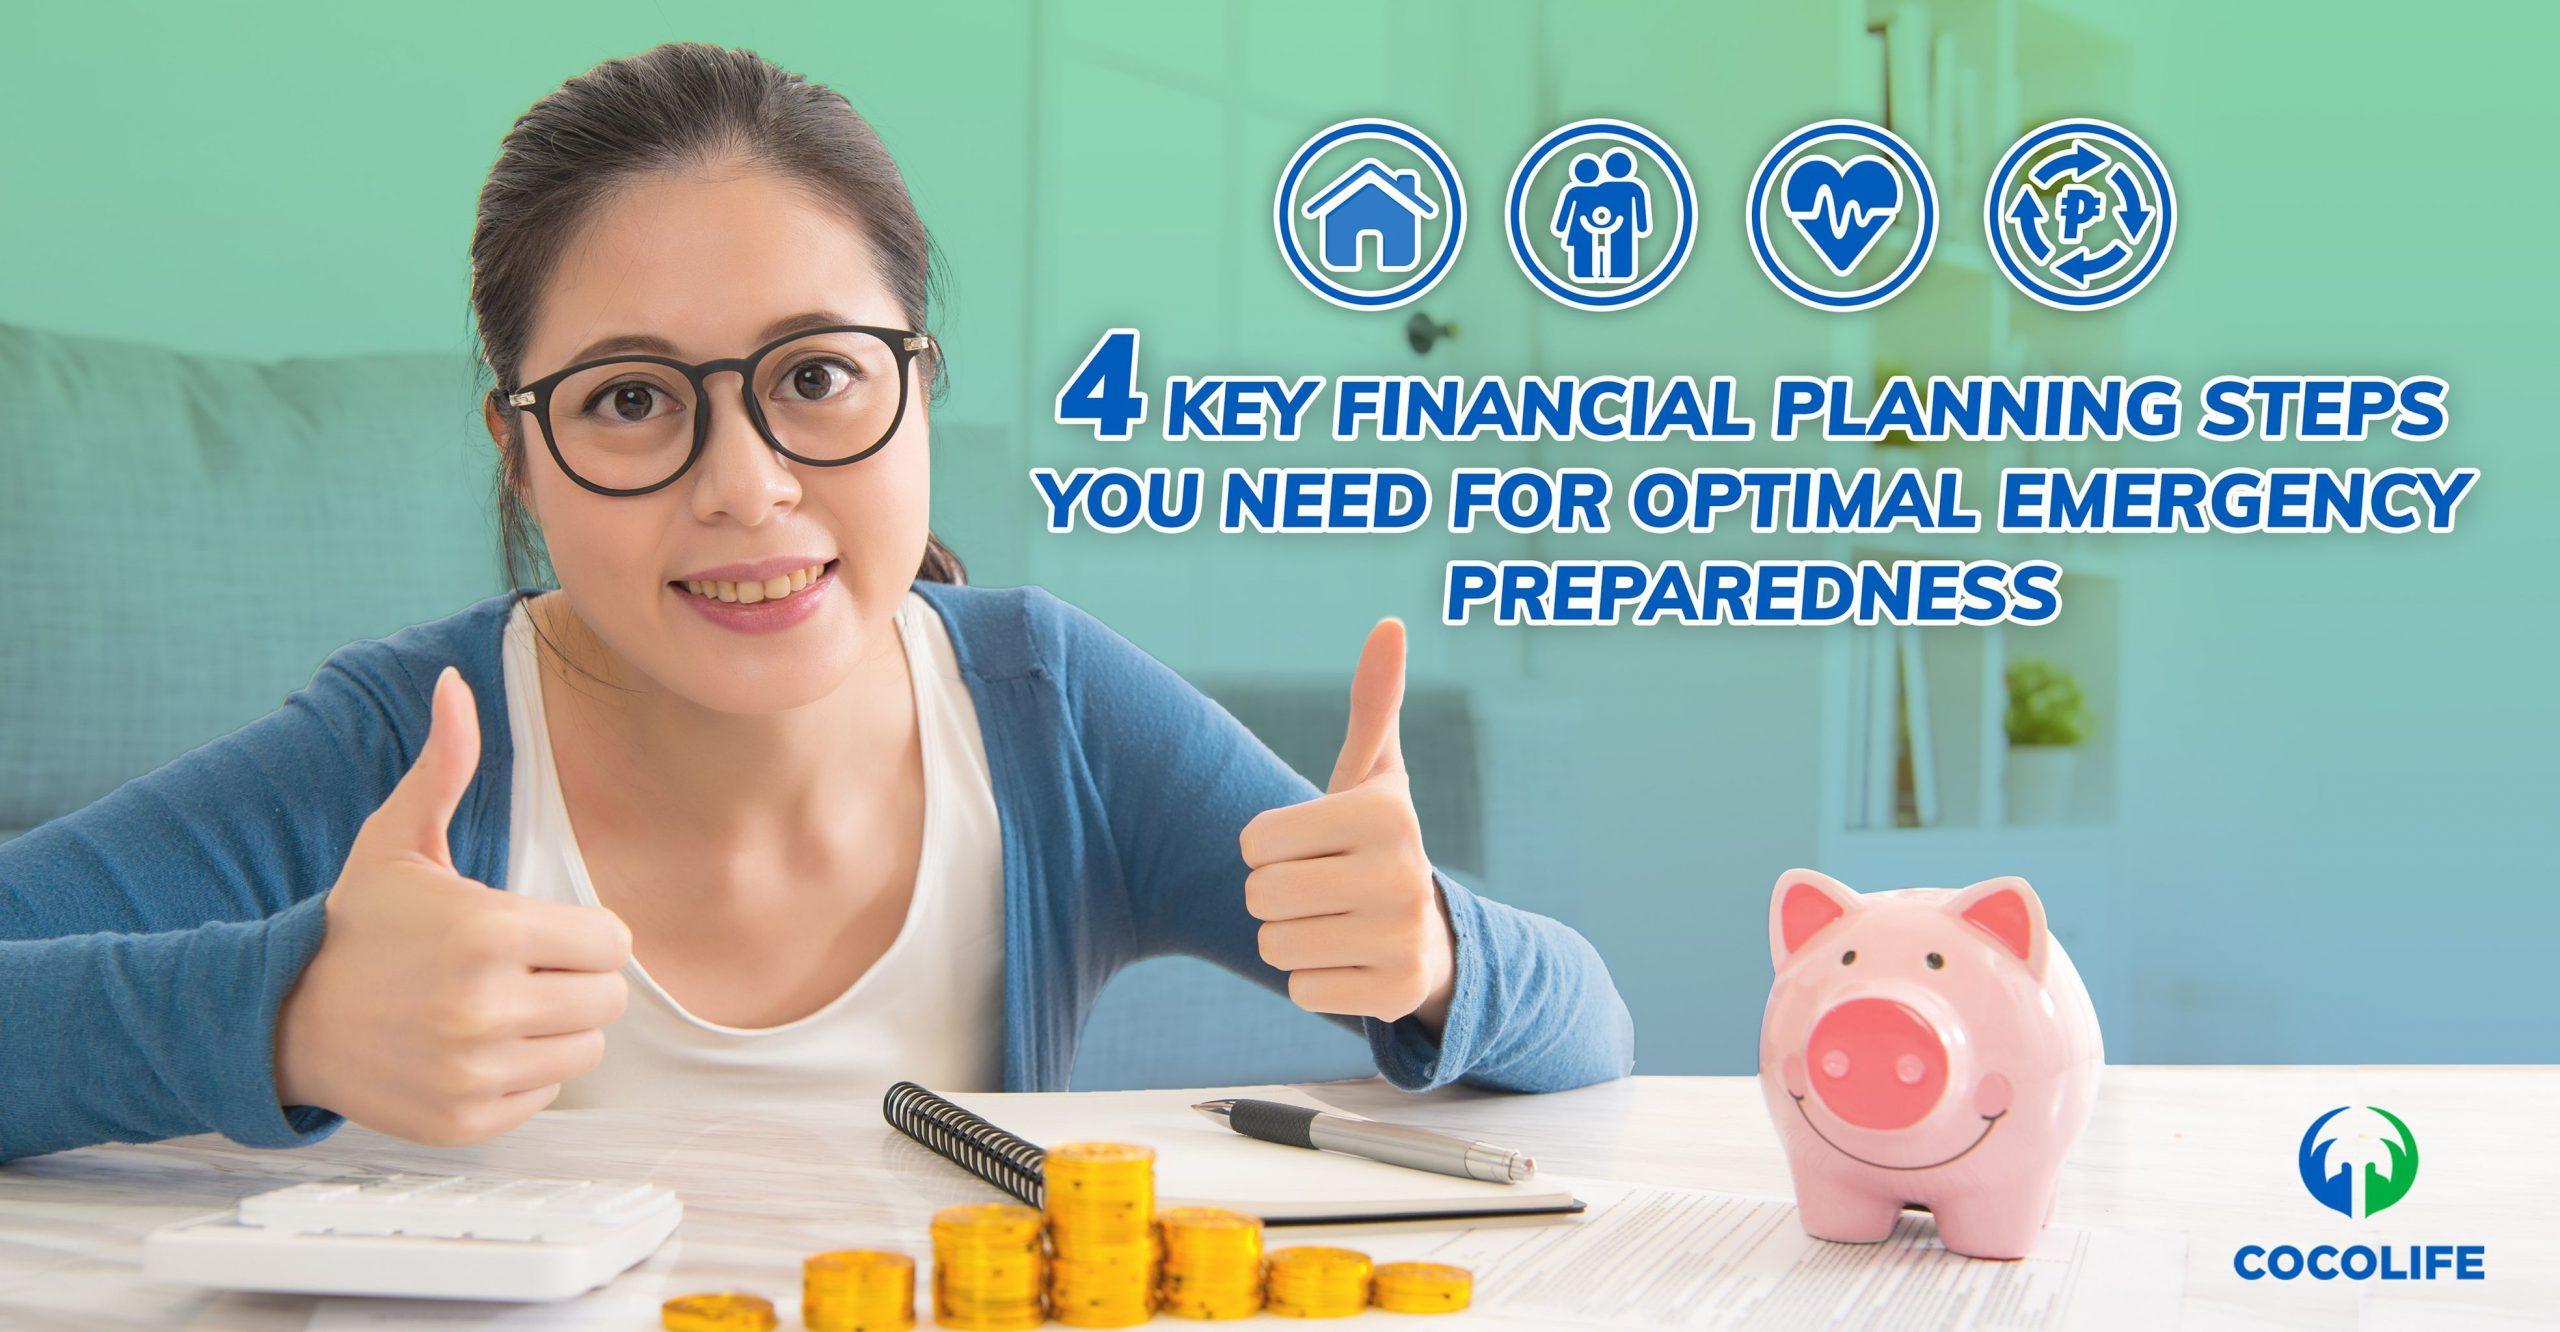 4 Key Financial Planning Steps you Need for Optimal Emergency Preparedness